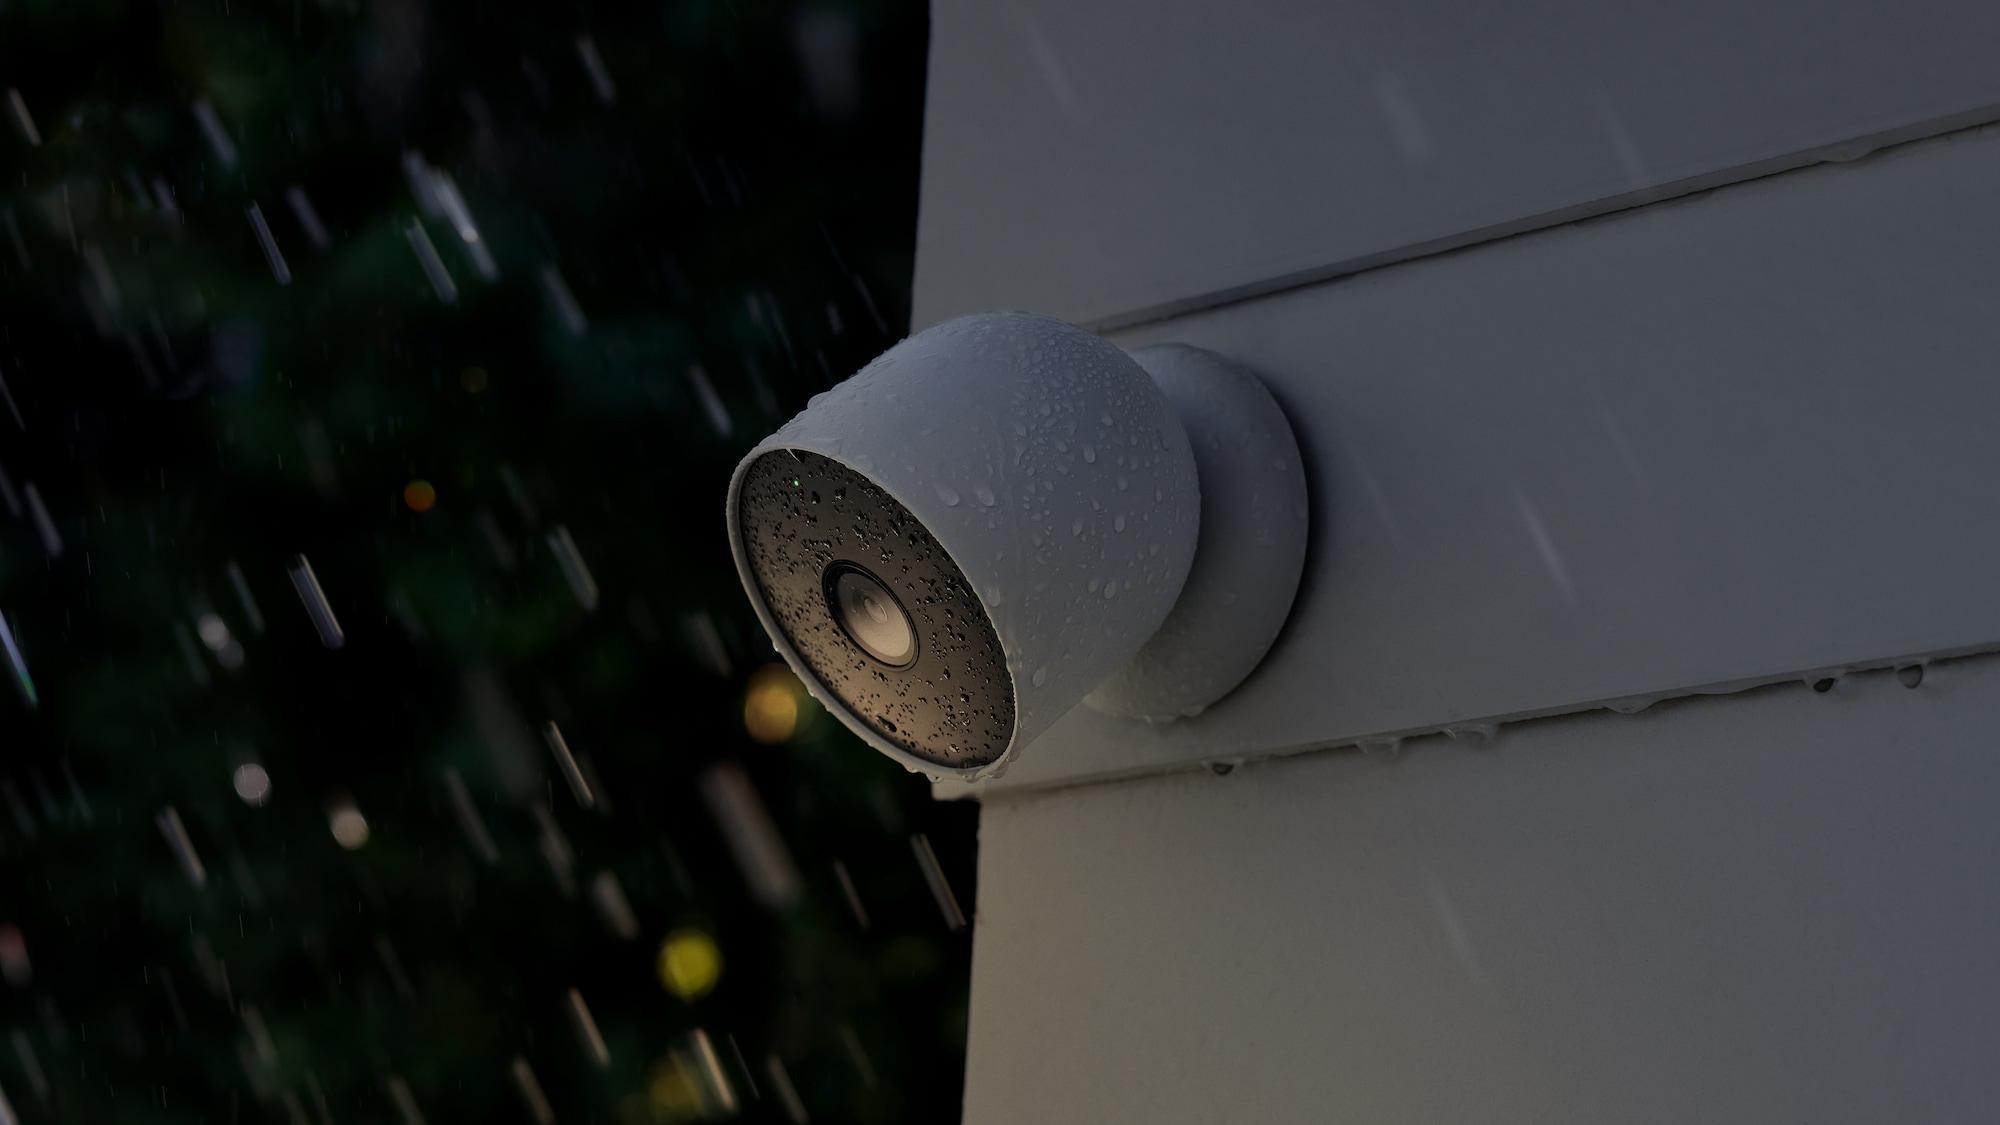 Battery-powered Google Nest Cam